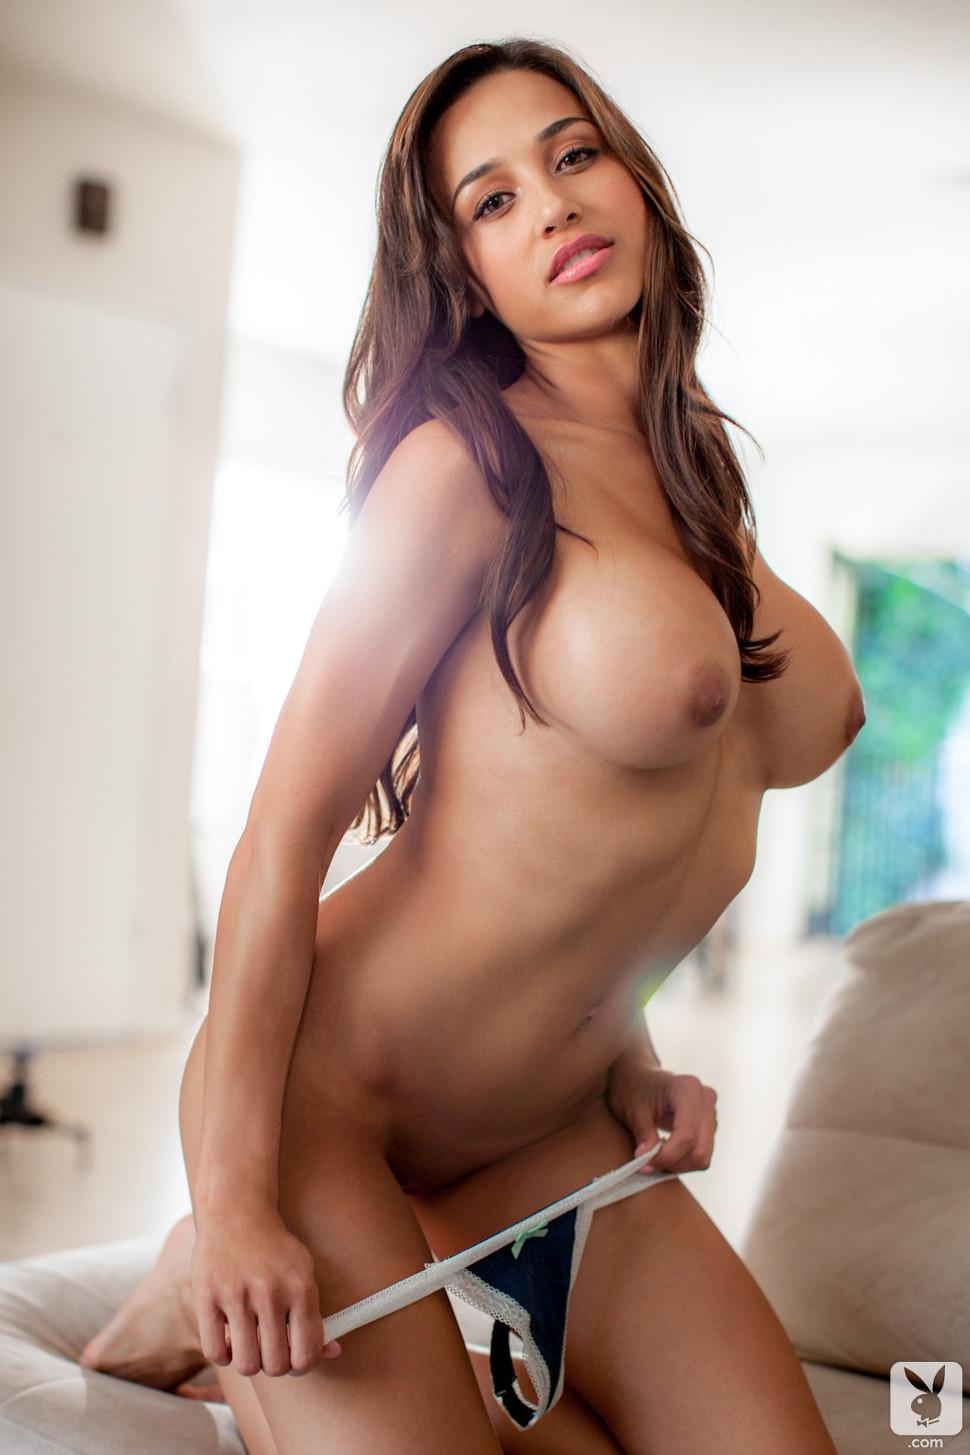 Ana Cheri Playboy ana cheri, musa do instagram, nua na playboy : sweetlicious: